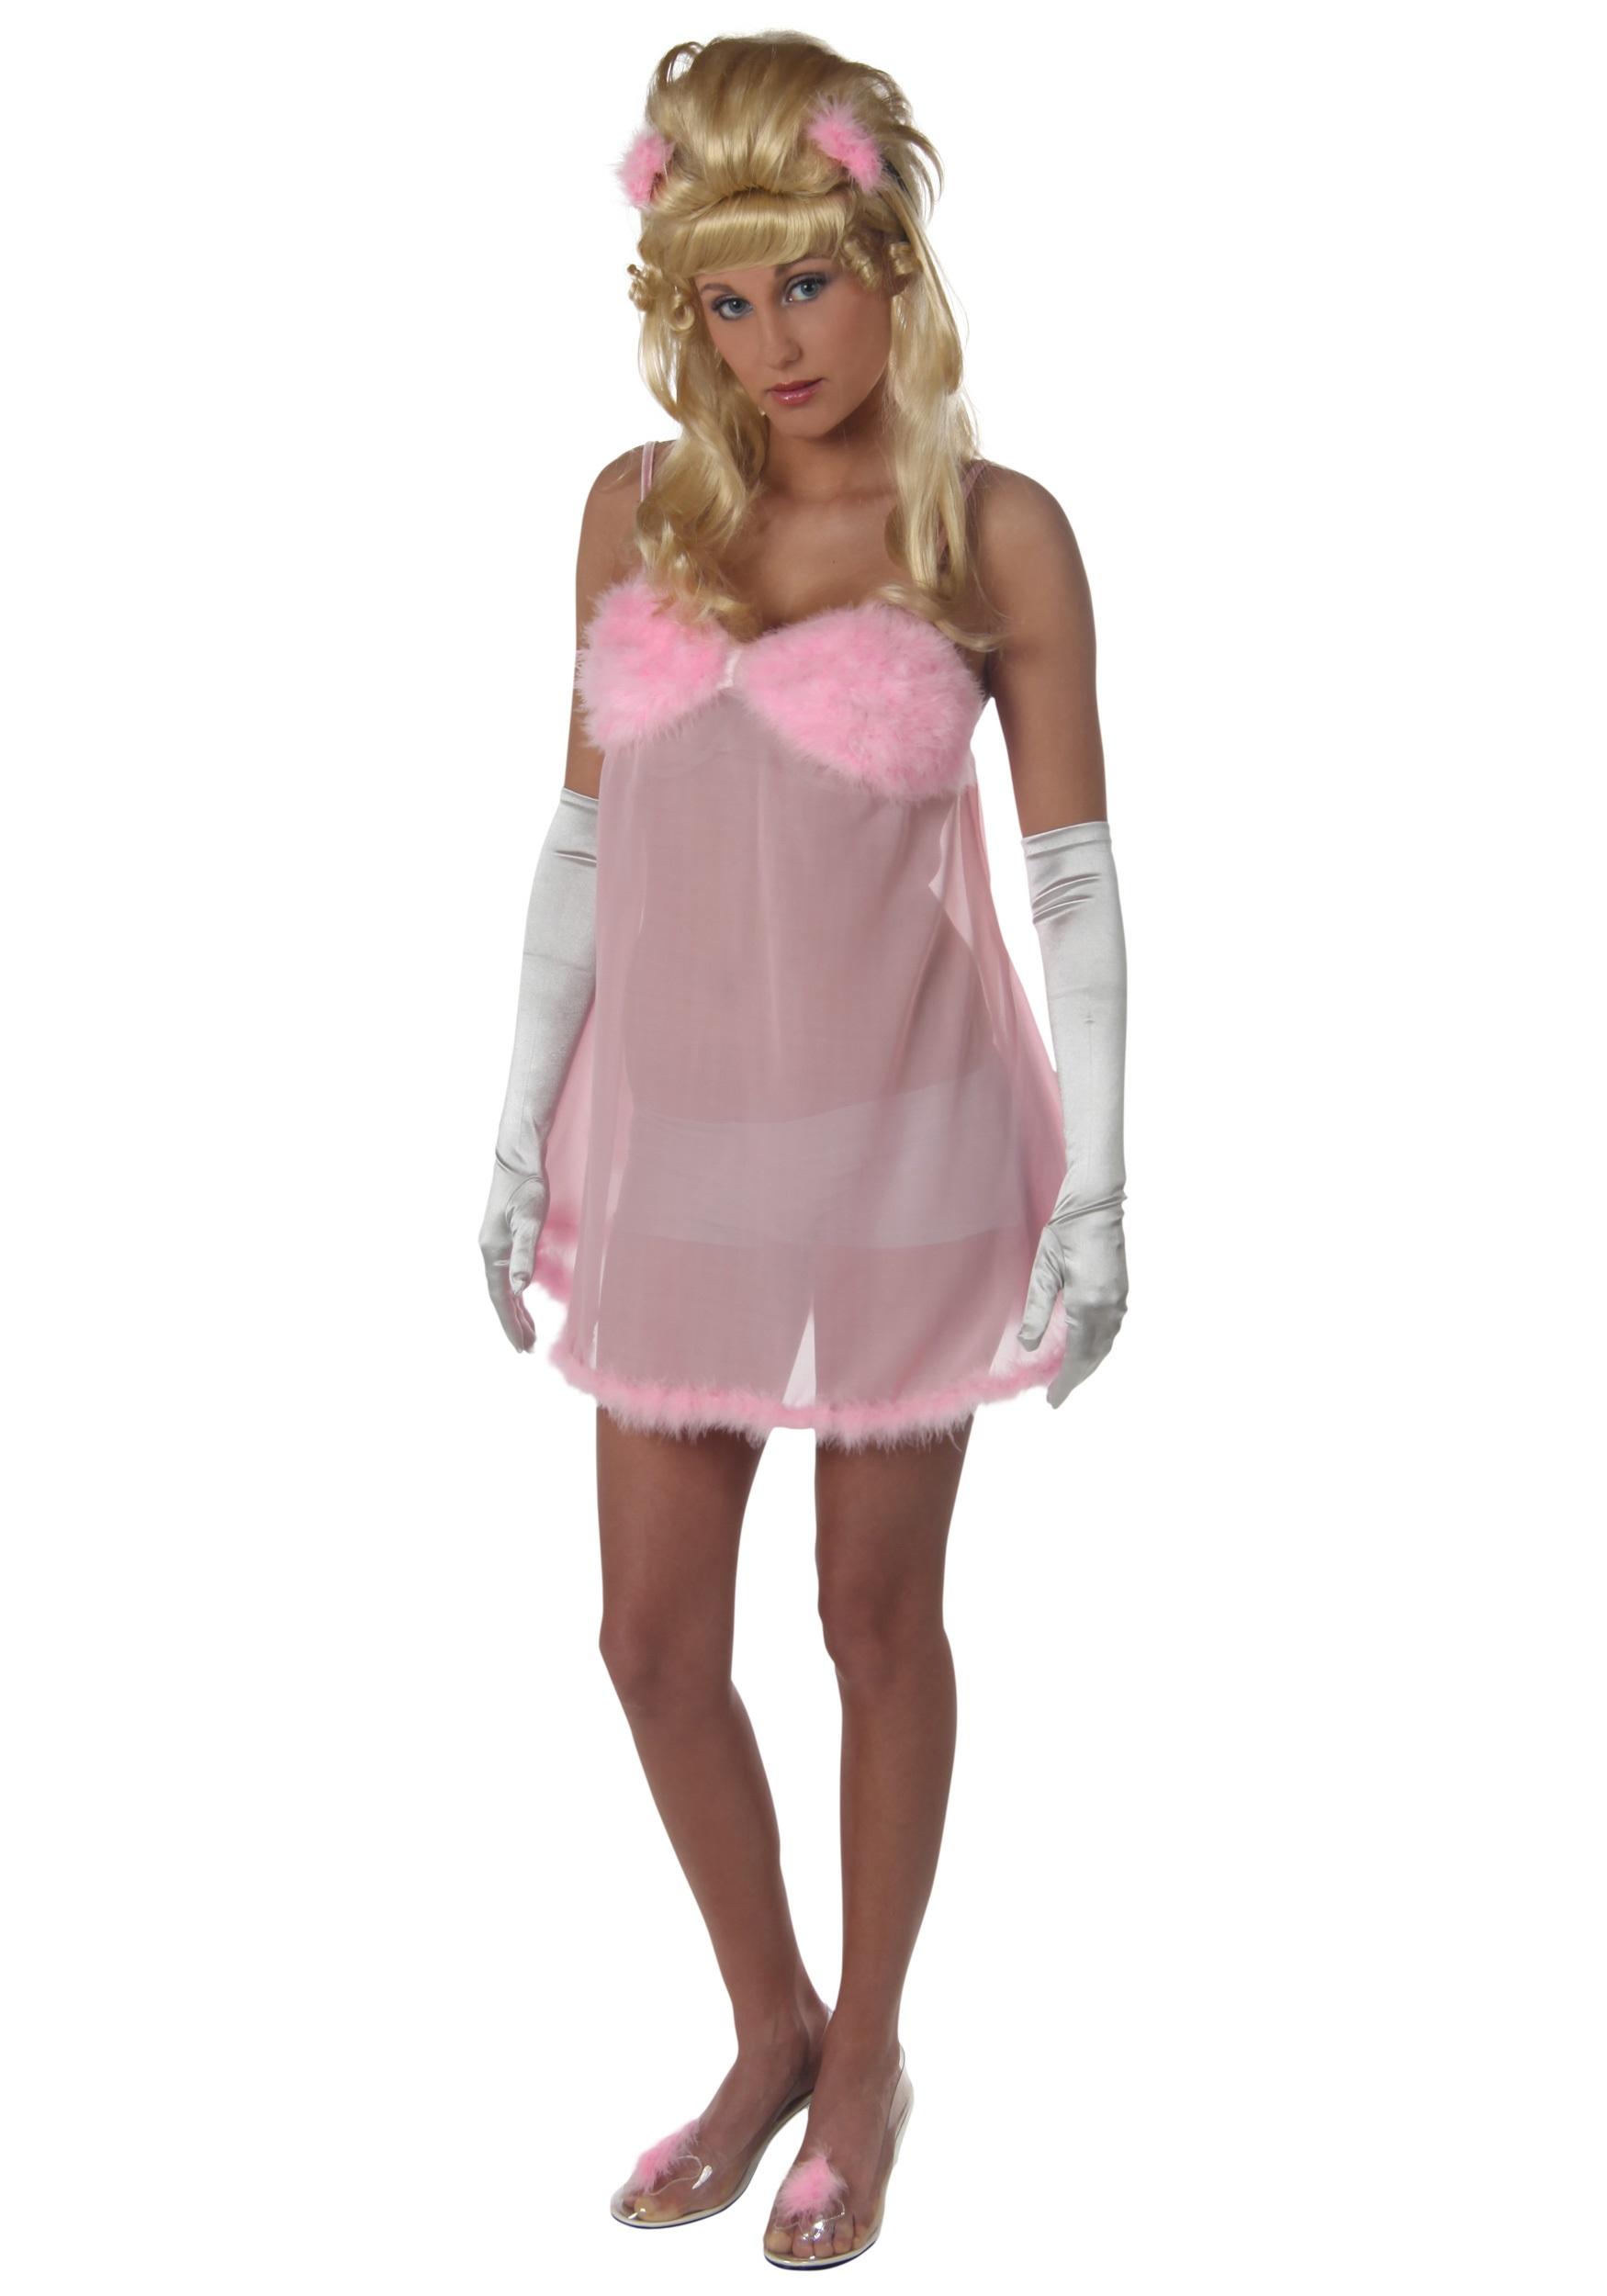 Adult Feminine Robot Costume  sc 1 st  Halloween Costumes & Adult Feminine Robot Costume - Halloween Costumes